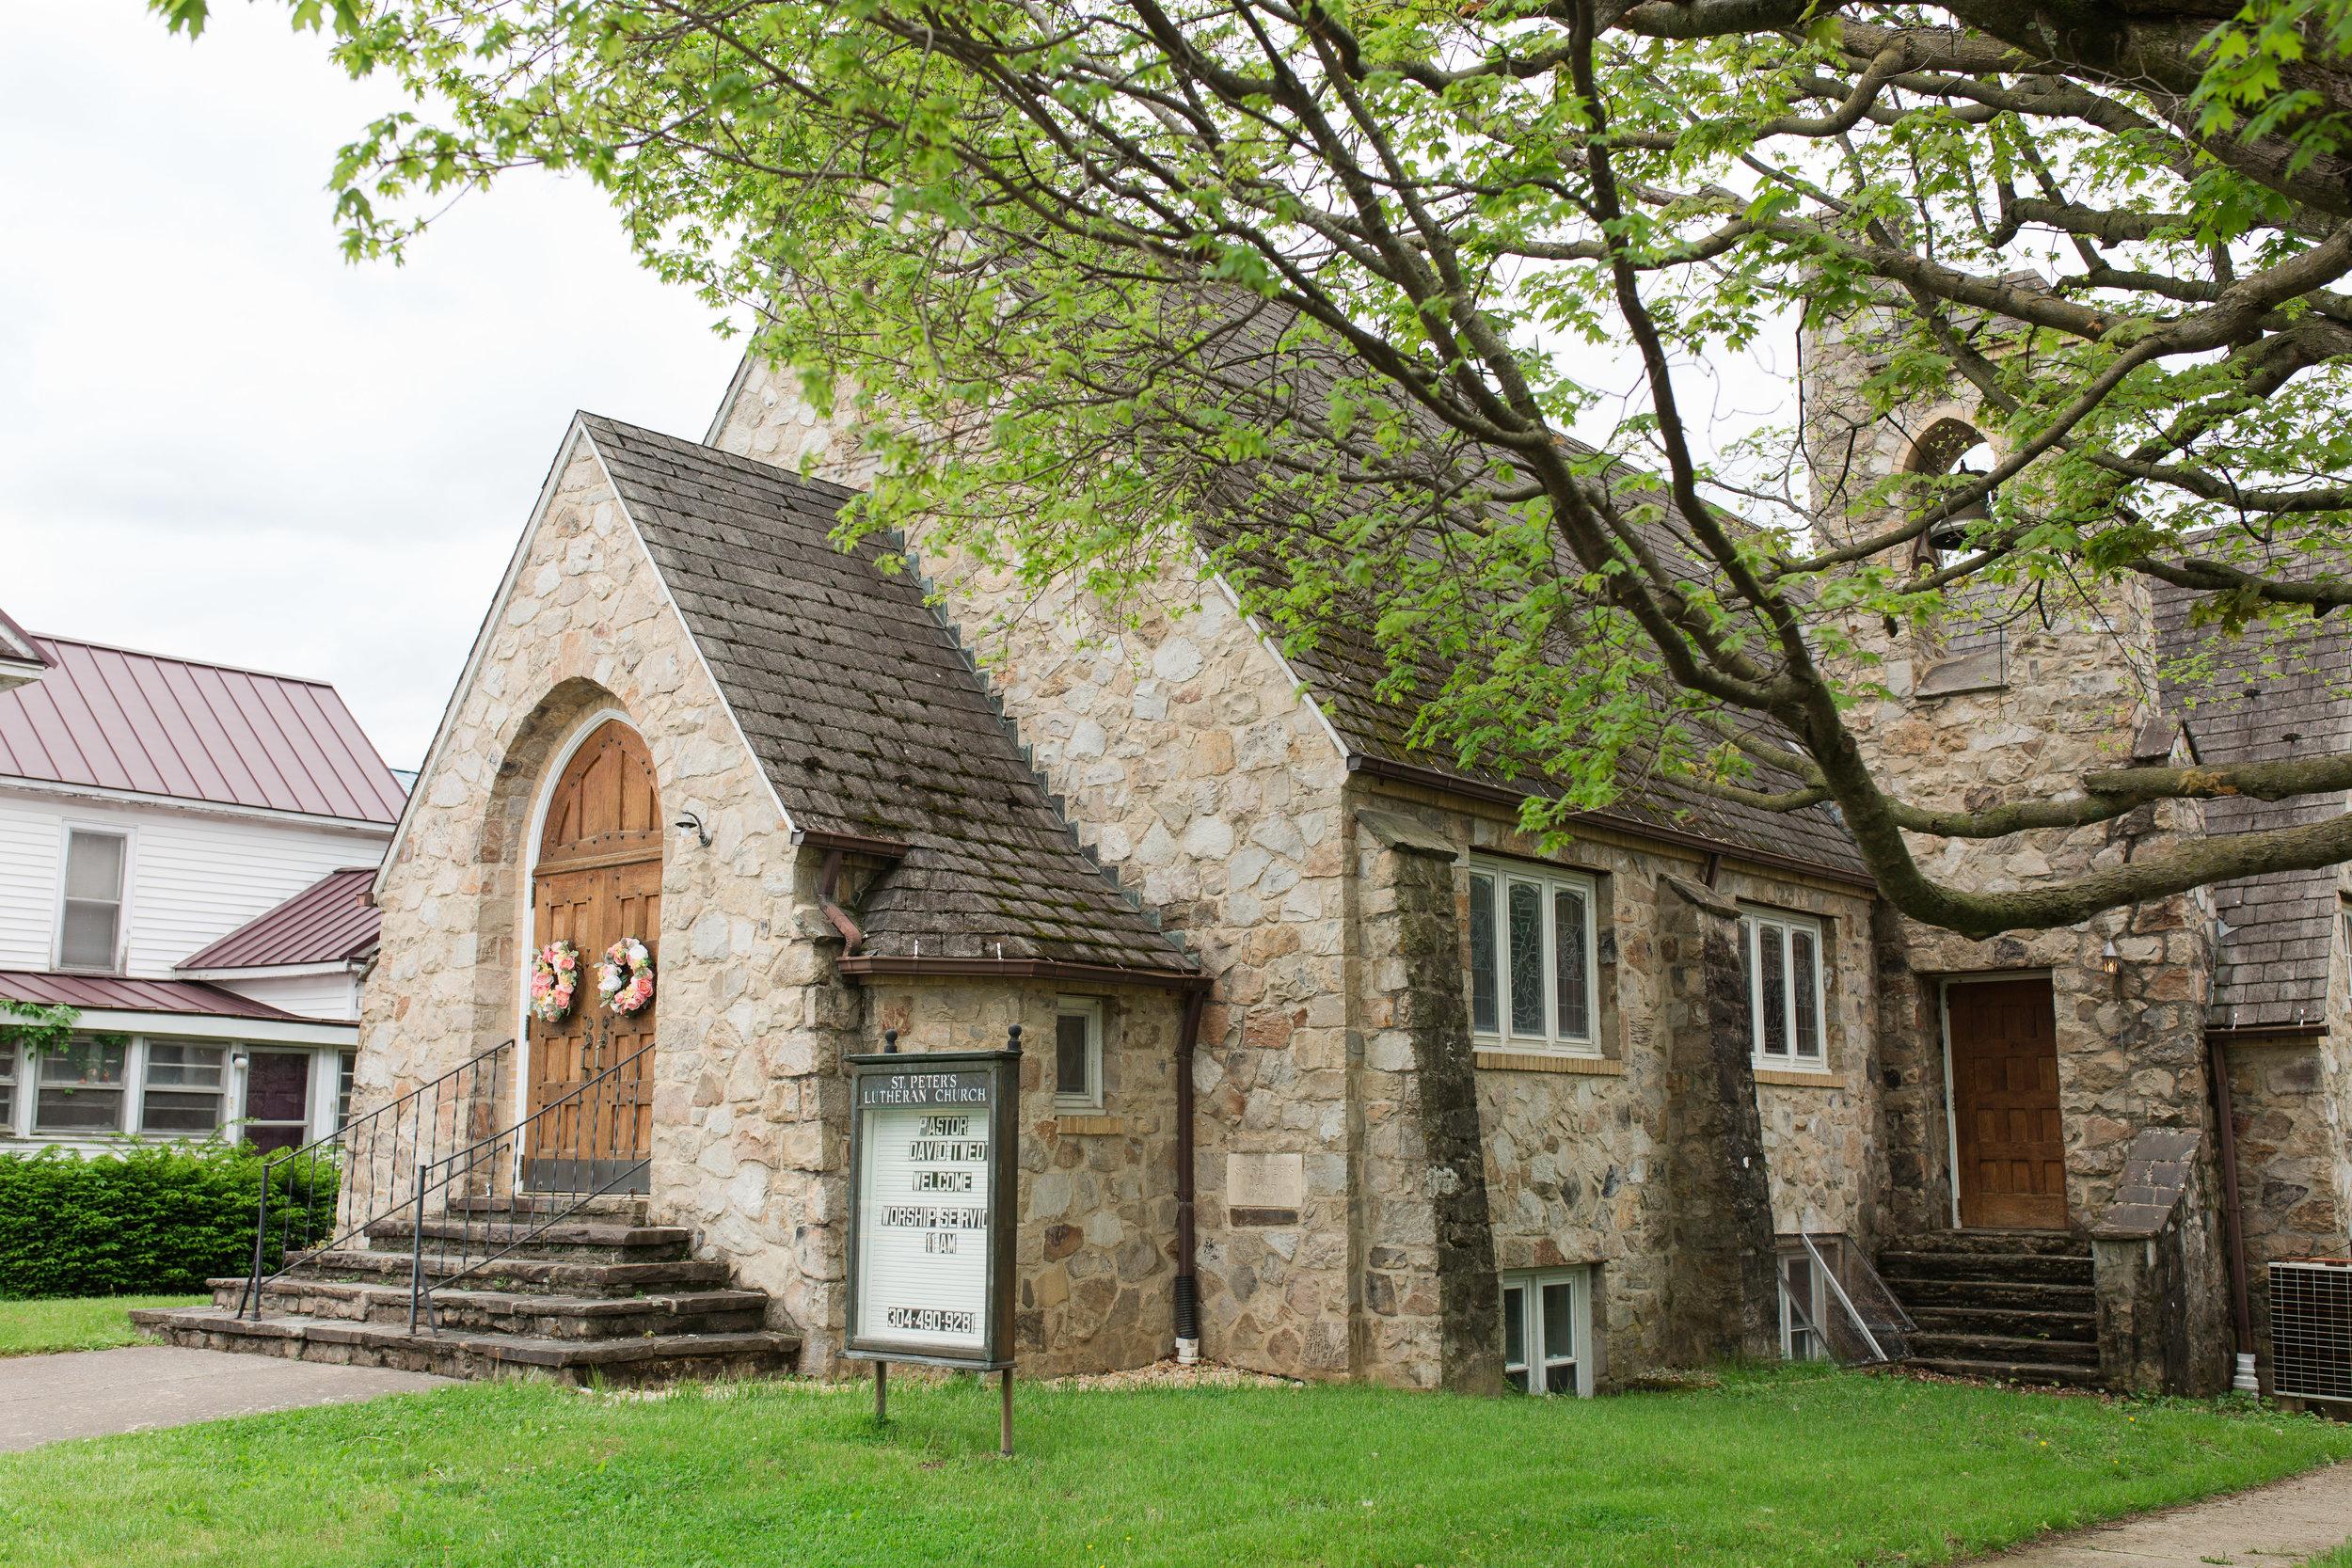 st. peter lutheran church, wardensville, wv